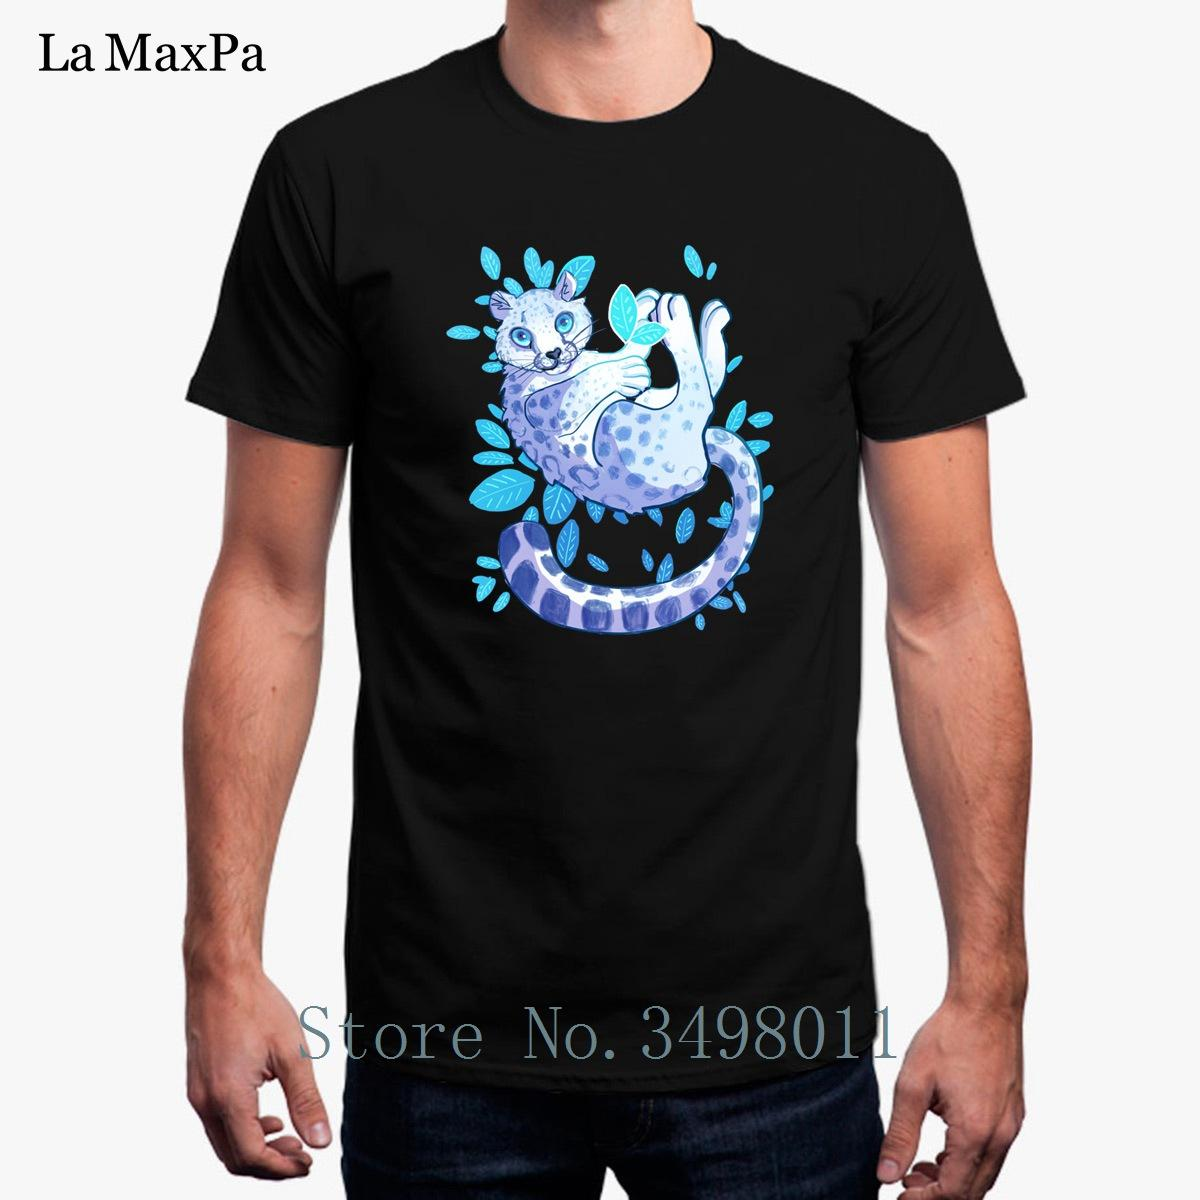 153d9dcae5dc High Quality Snow Leopard T Shirt Costume Men T Shirt 100% Cotton Cool Mens Tee  Shirt Short Sleeved Plus Size Design Tops Online Shop T Shirt Shirts ...